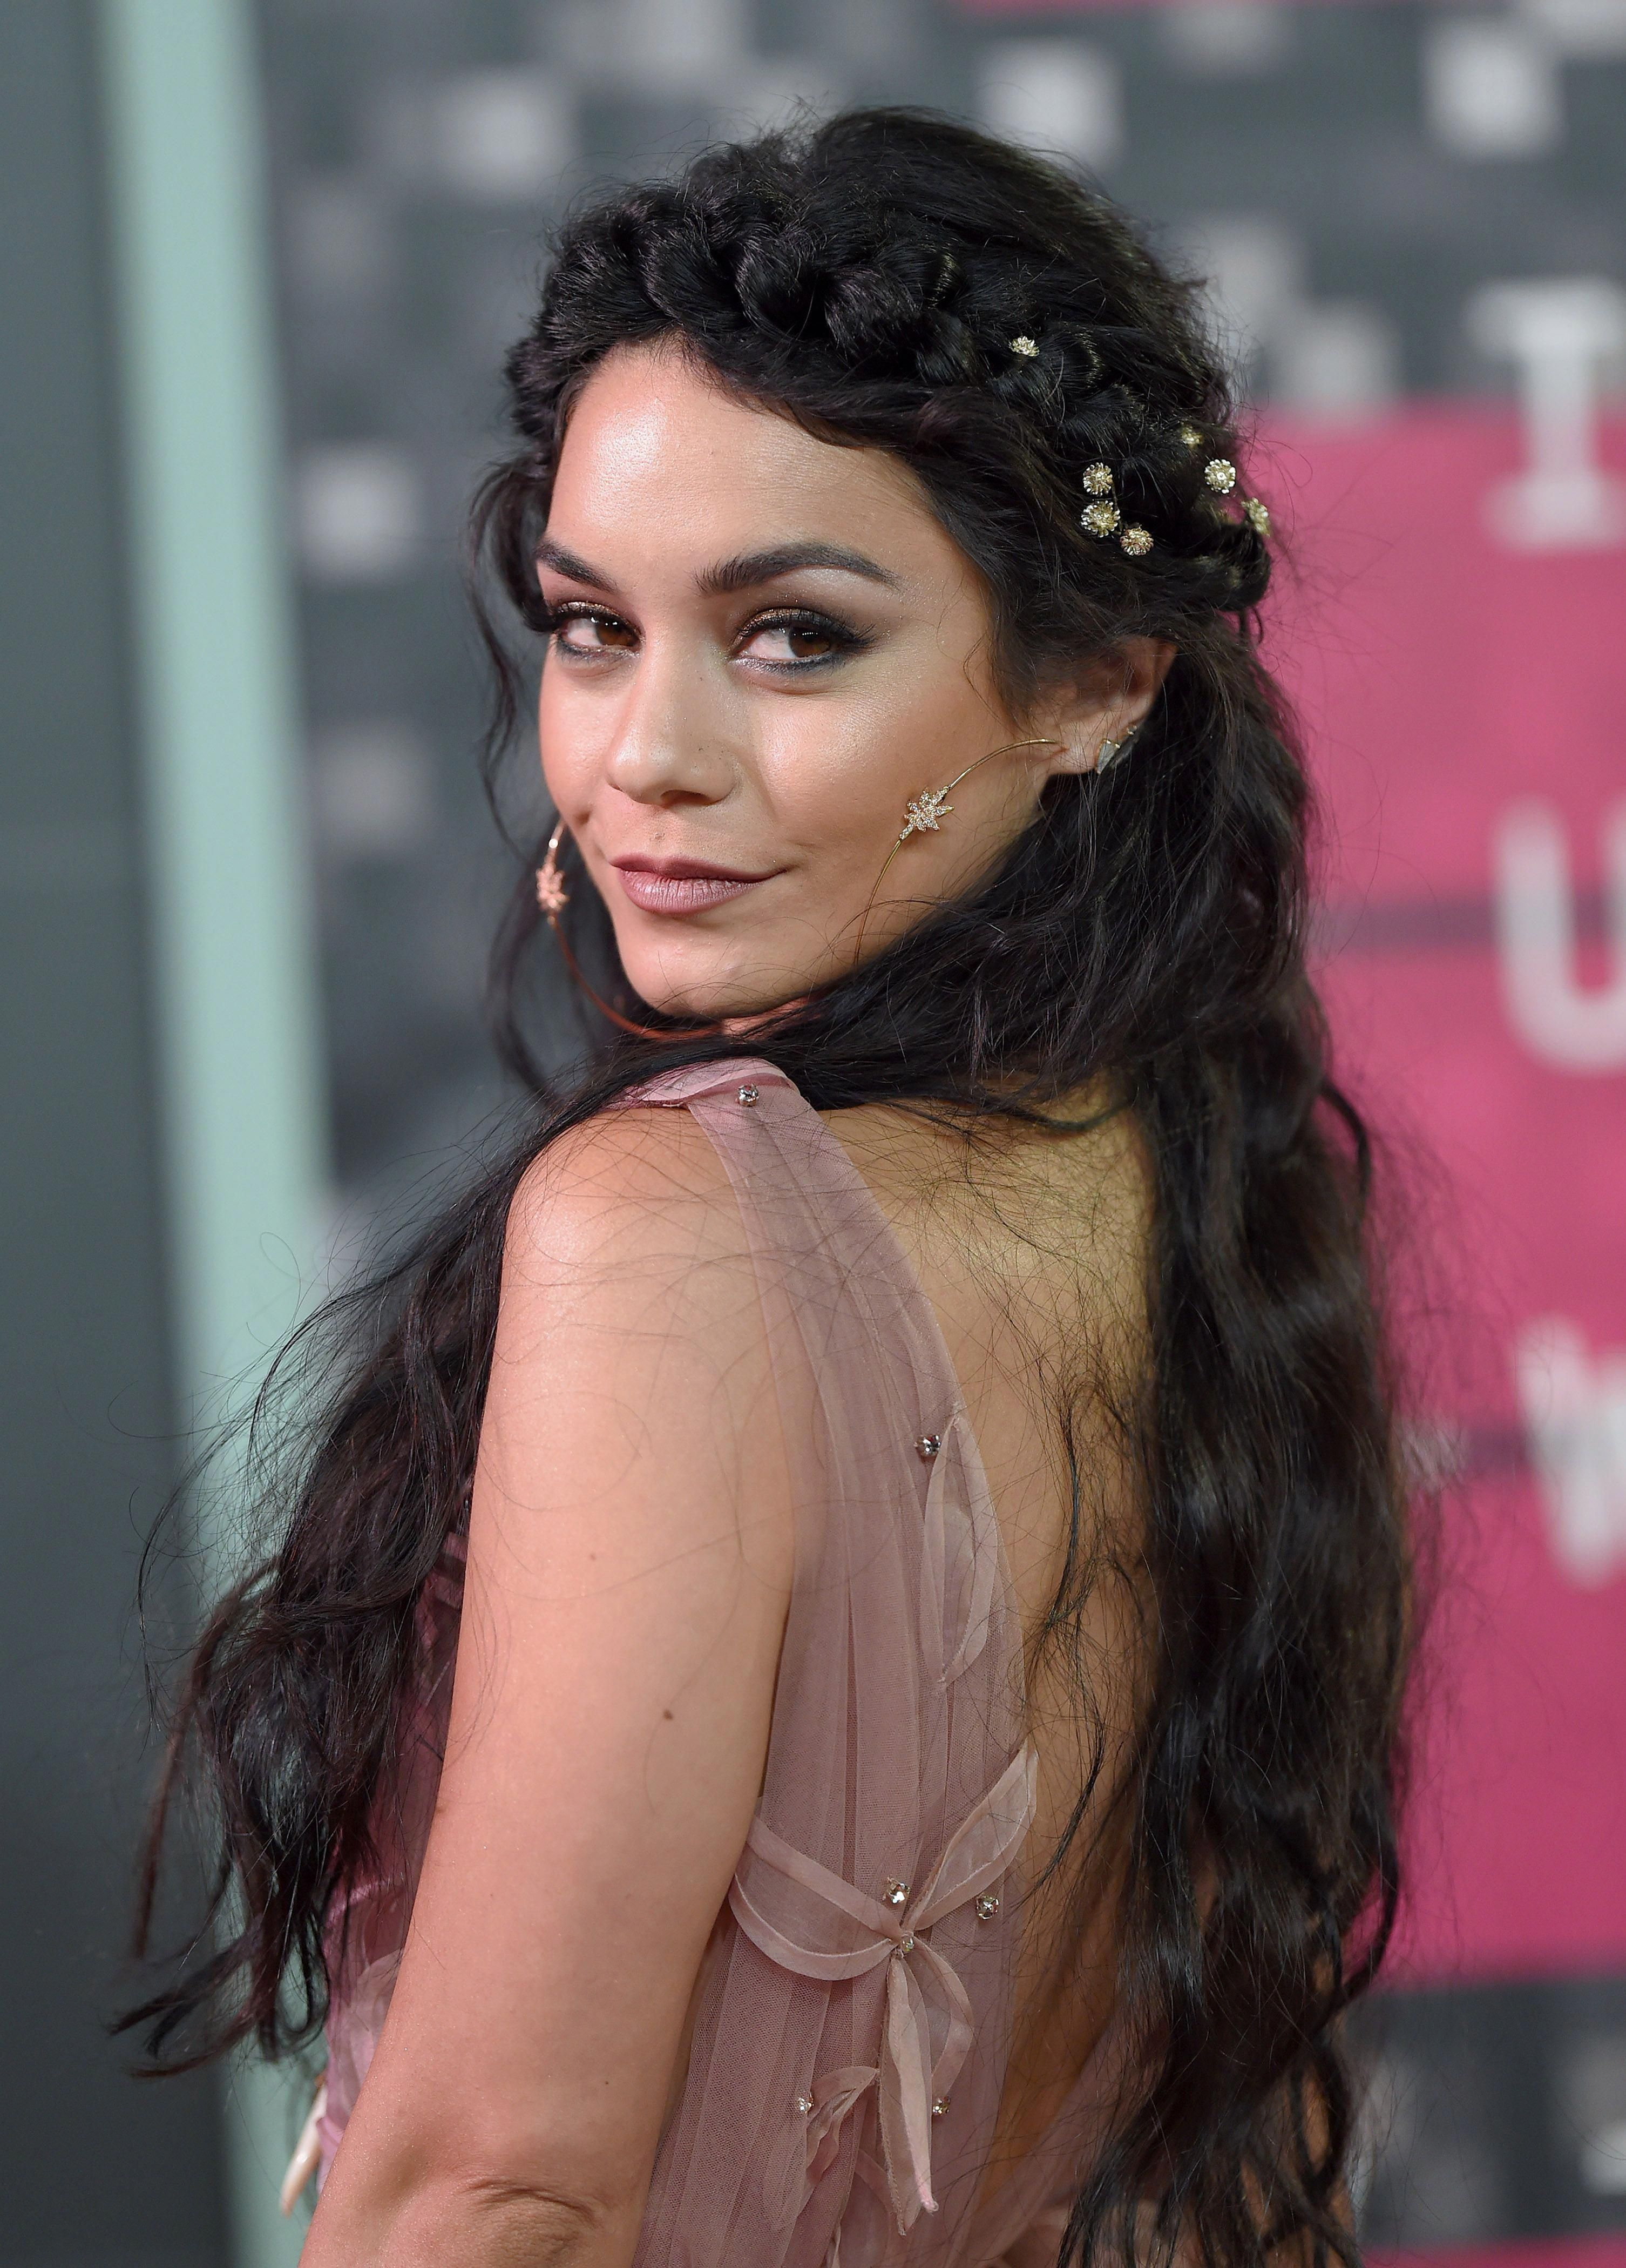 vanessa hudgens prom hair inspiration | prom hairstyles ...